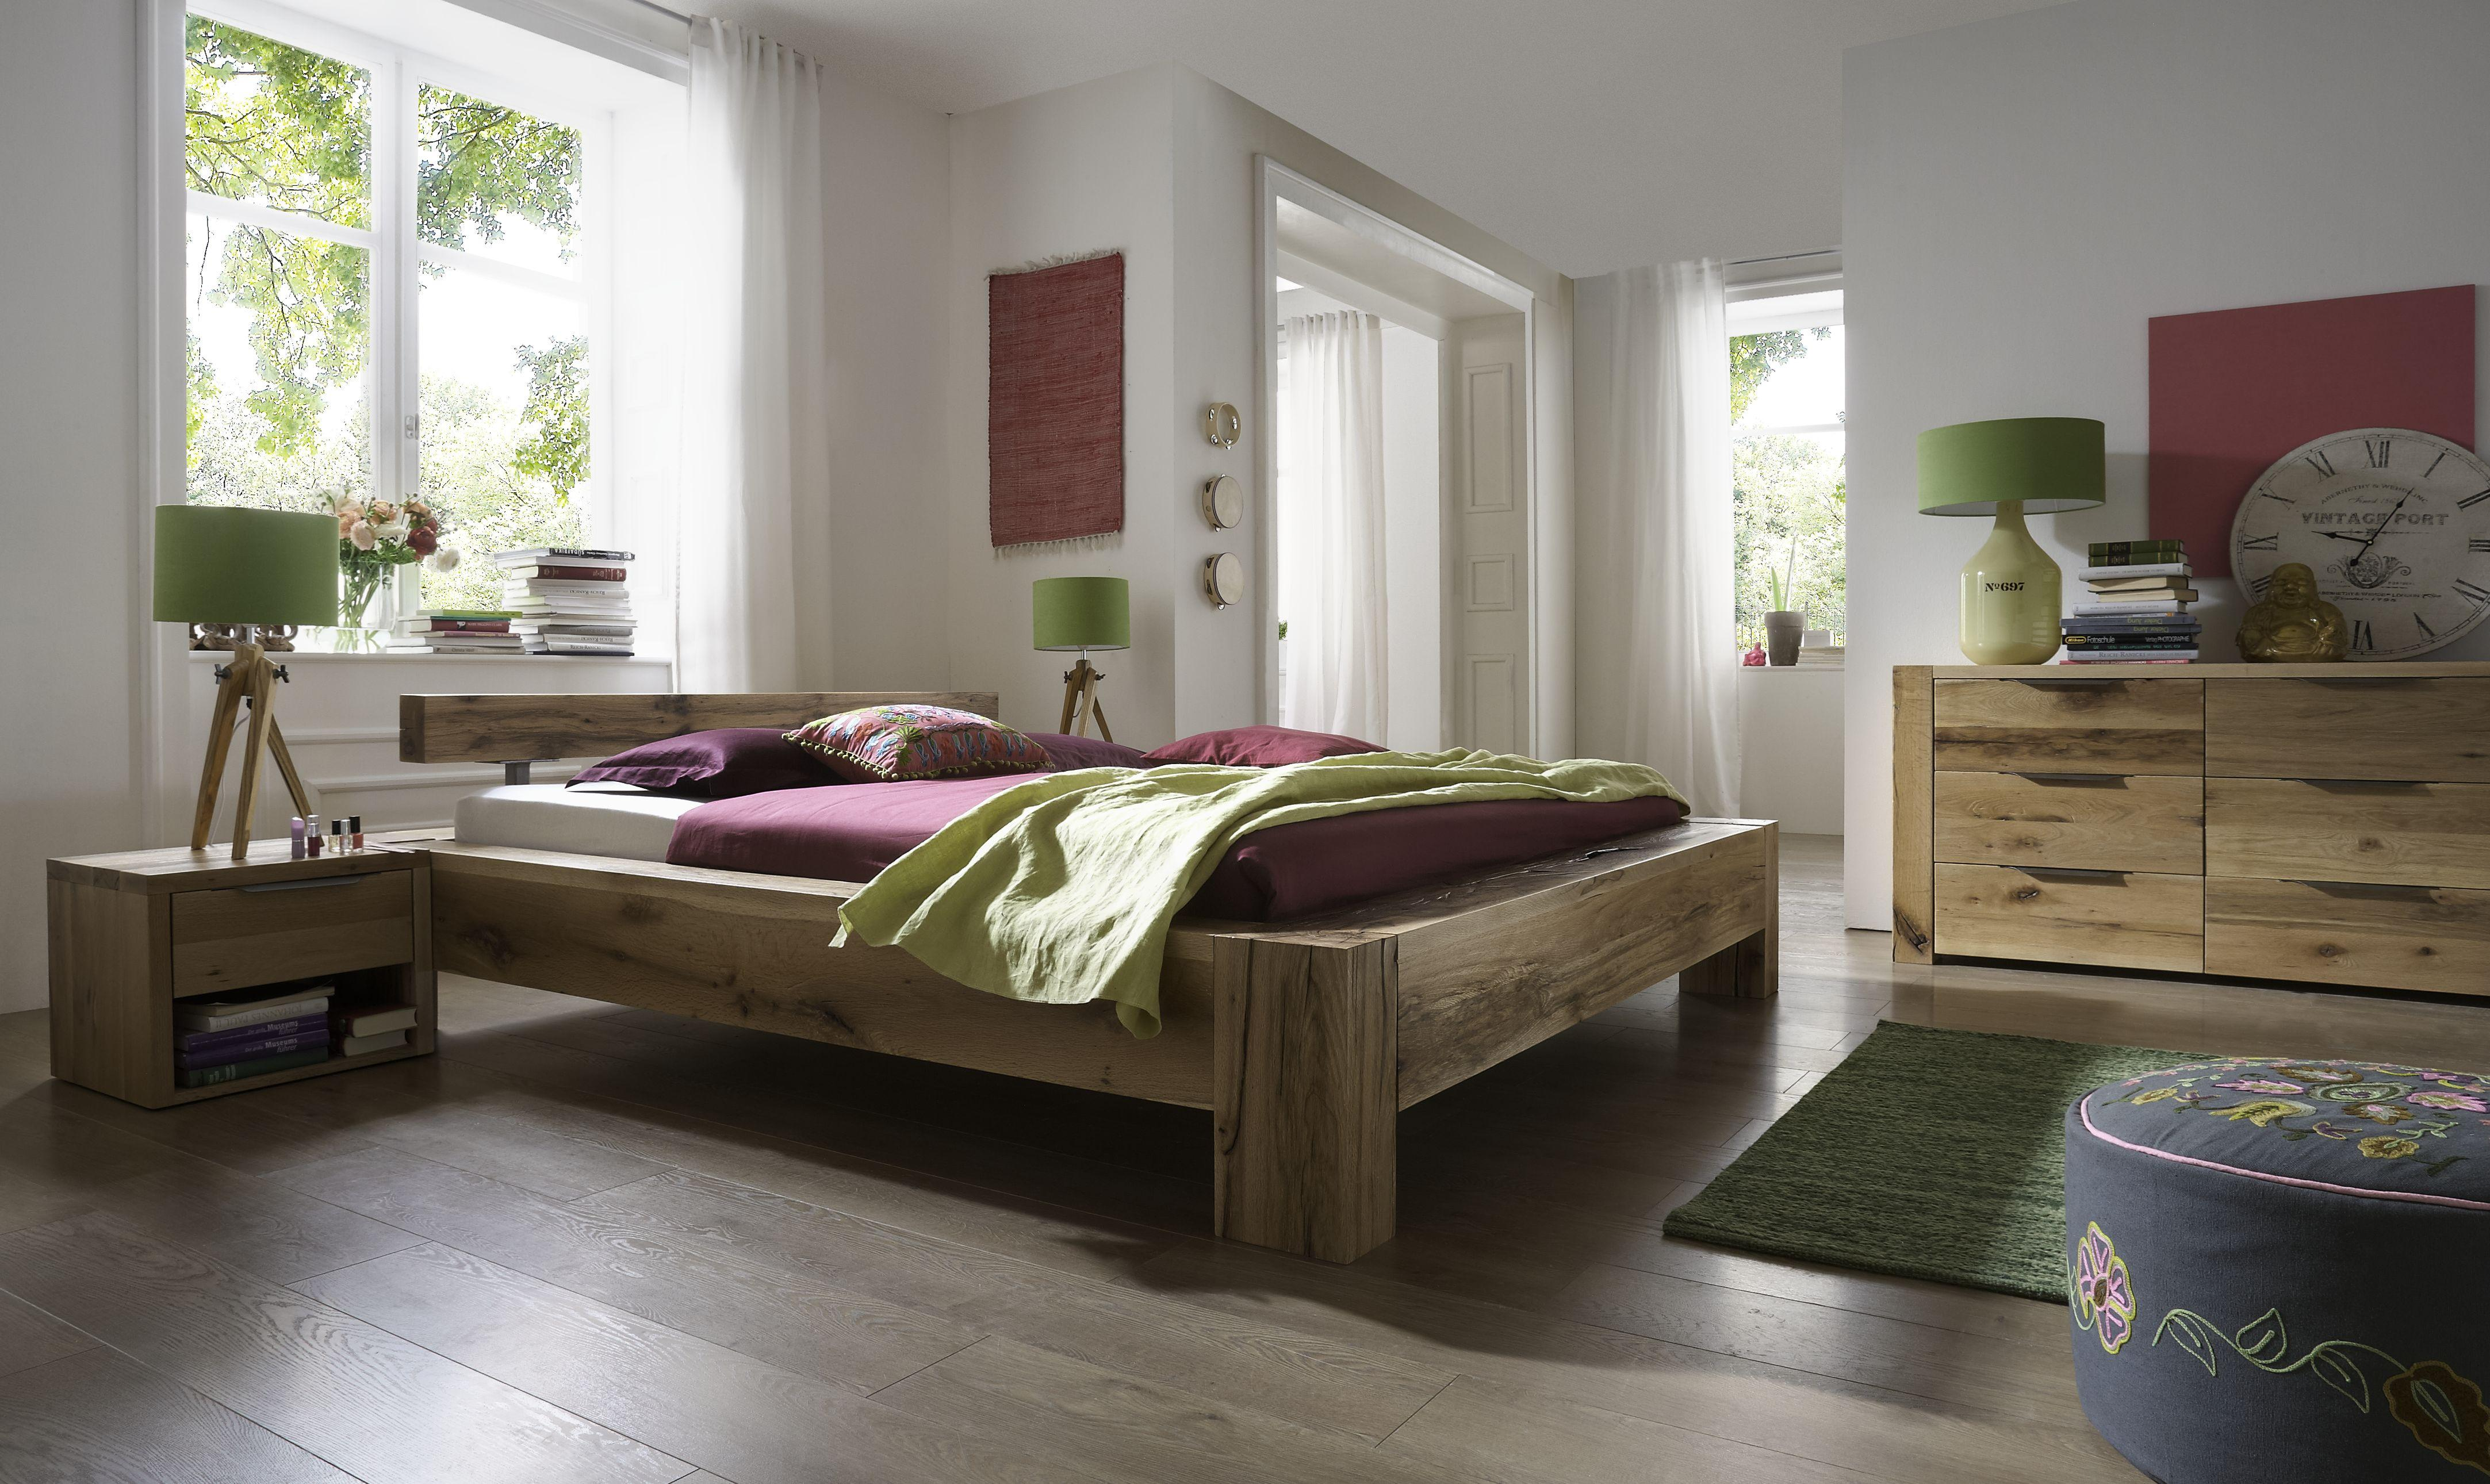 Balkenbett Heavy Sleep aus Massivholz Eiche geölt